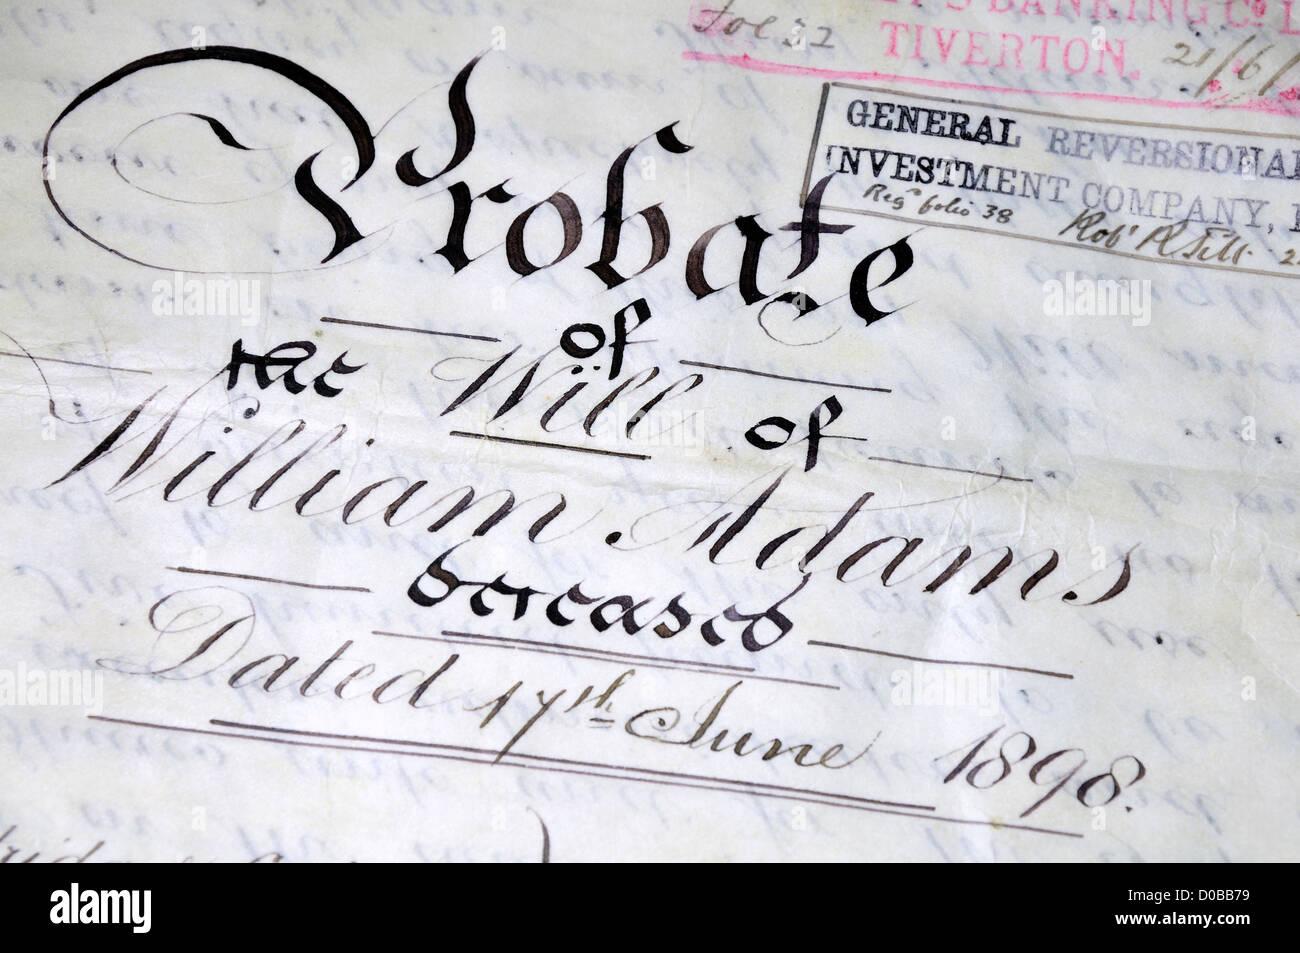 Handwritten Probate of the Will of William Adams from 1898, written on vellum - Stock Image